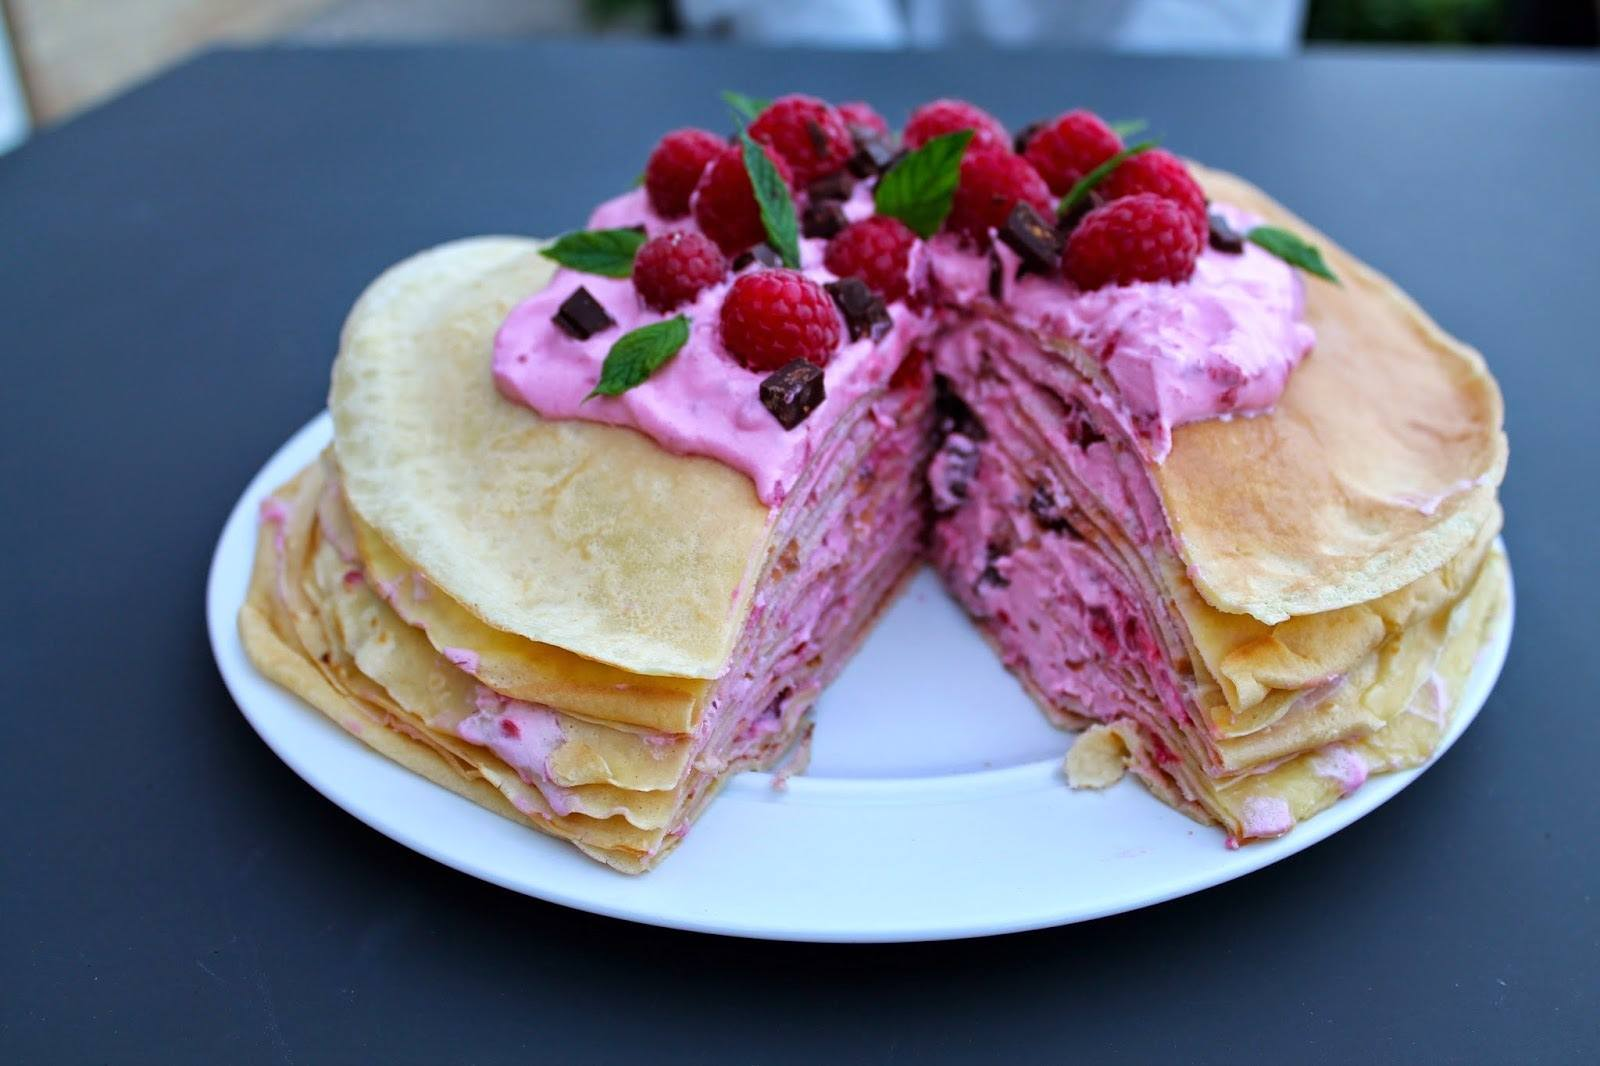 Pandekagelagkage med hindbær, vanilje og mørk chokolade